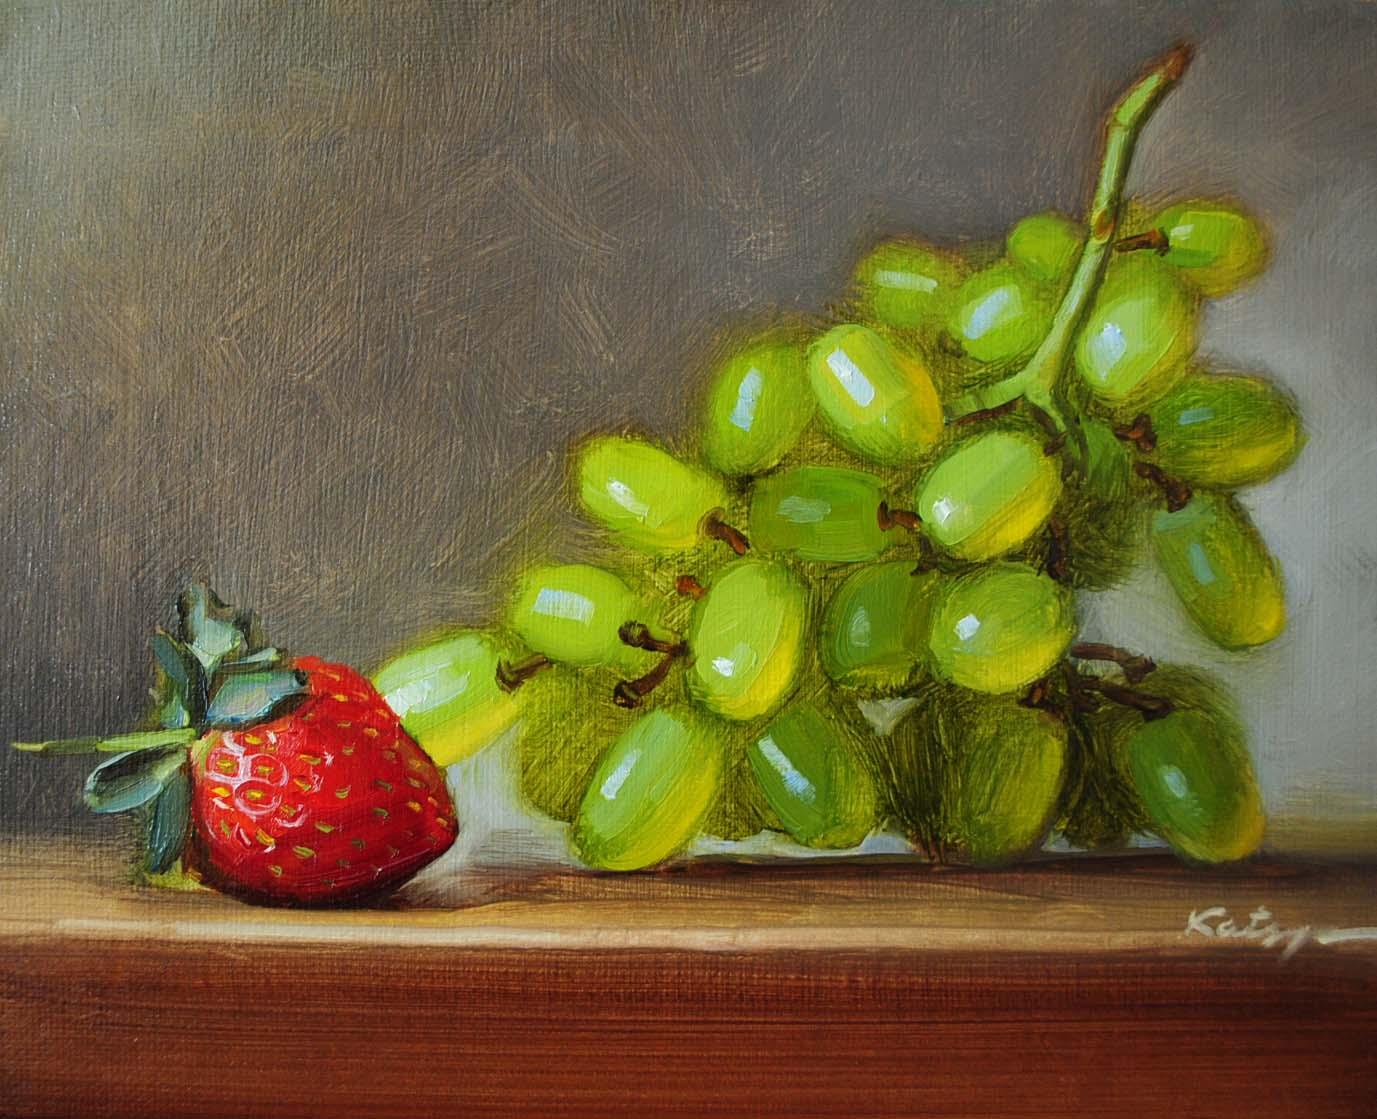 """Strawberry & Grapes"" original fine art by Elena Katsyura"